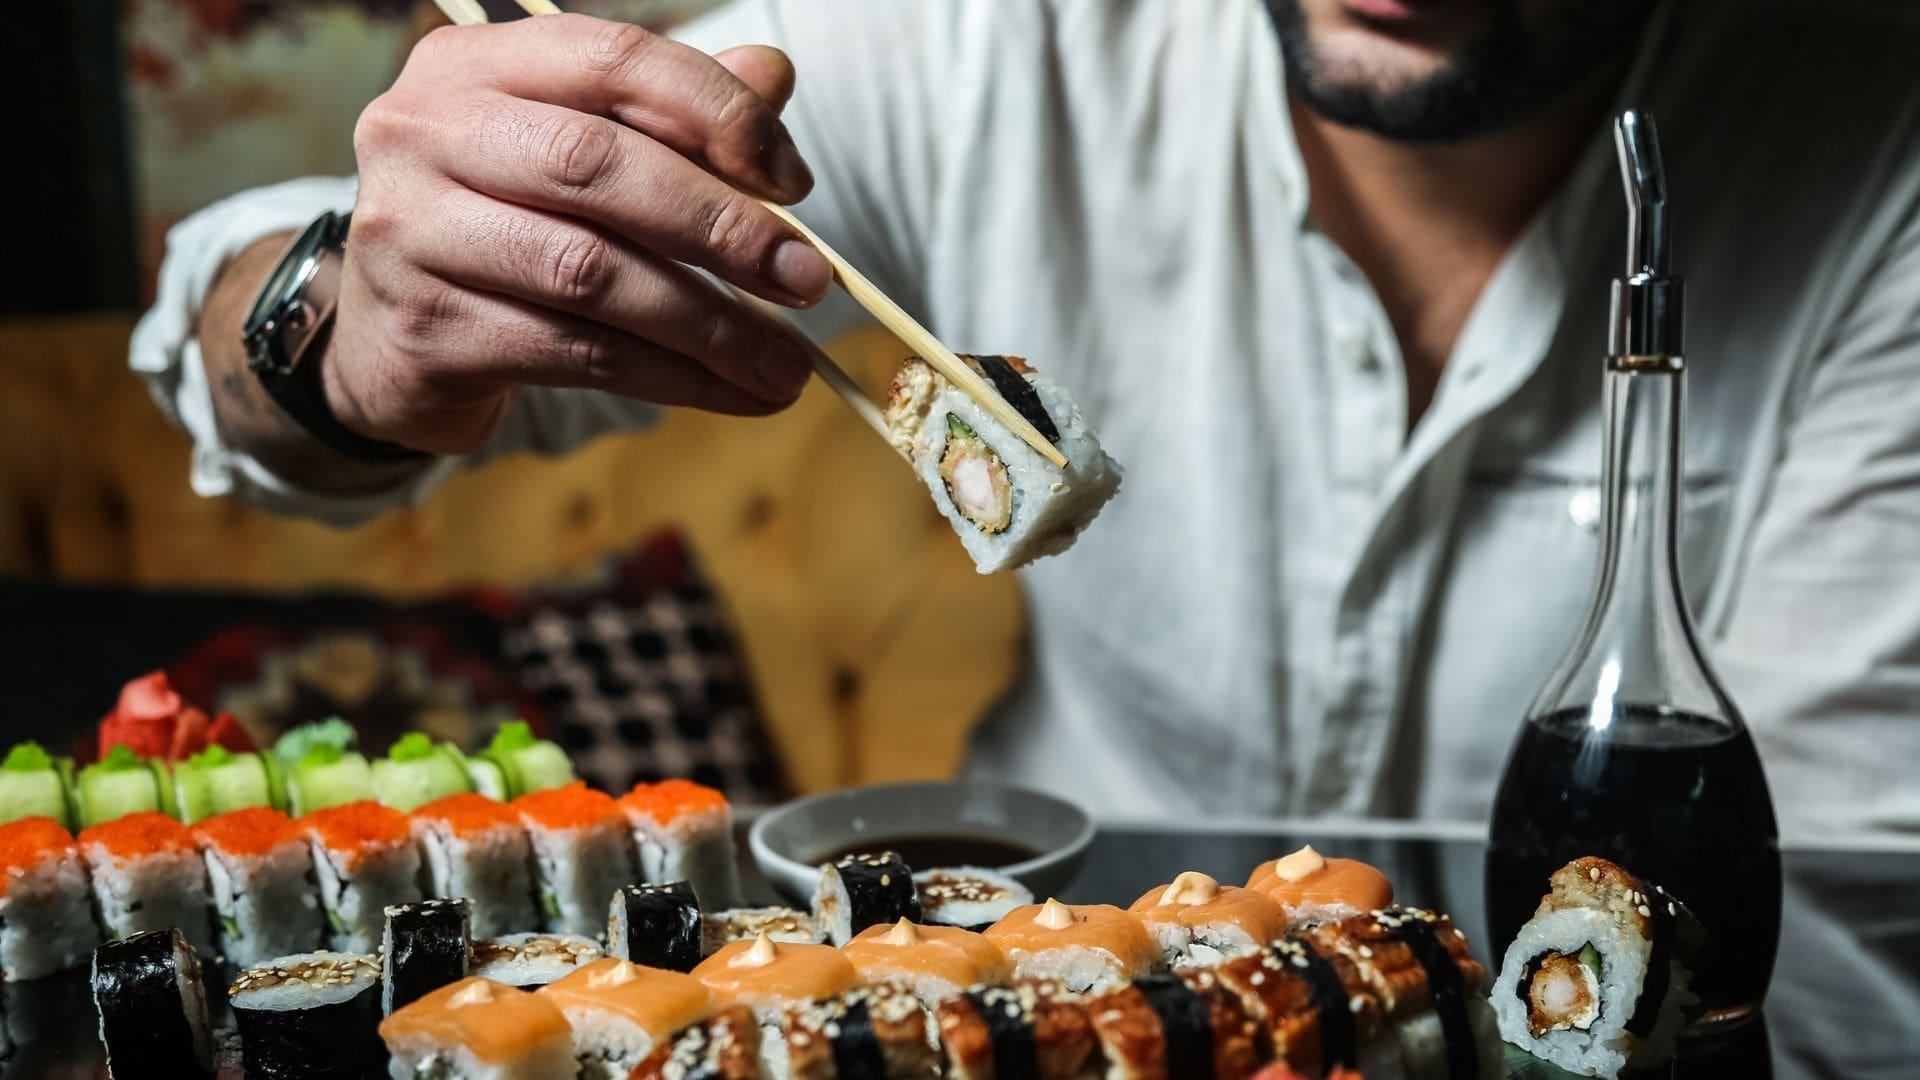 man eating sushi plate of salmon nigiri, California roll and soy sauce